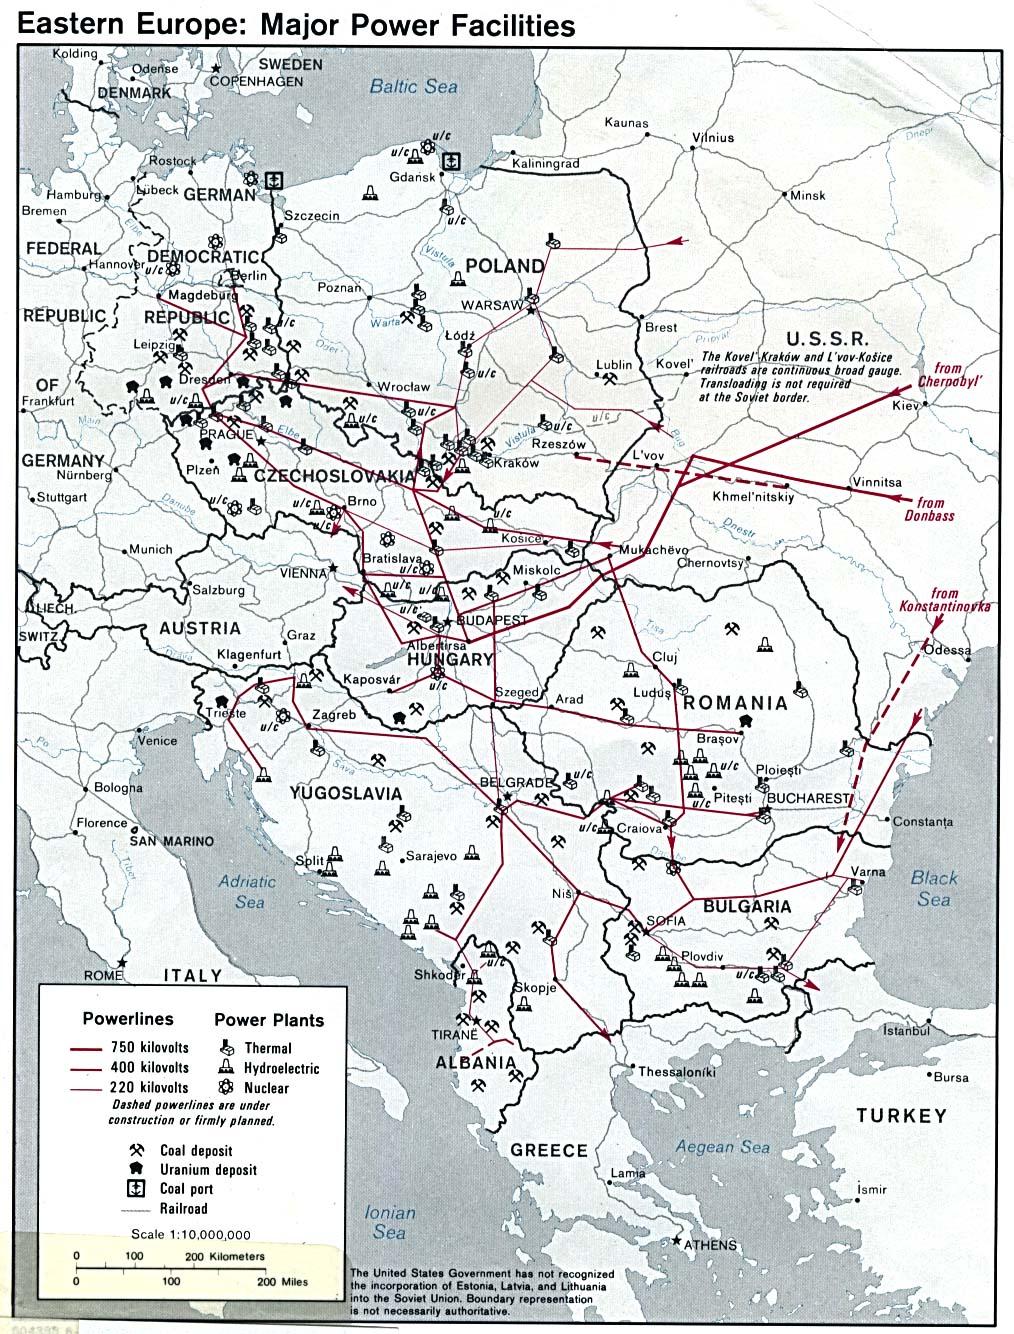 Eastern Europe major power facilities 1980